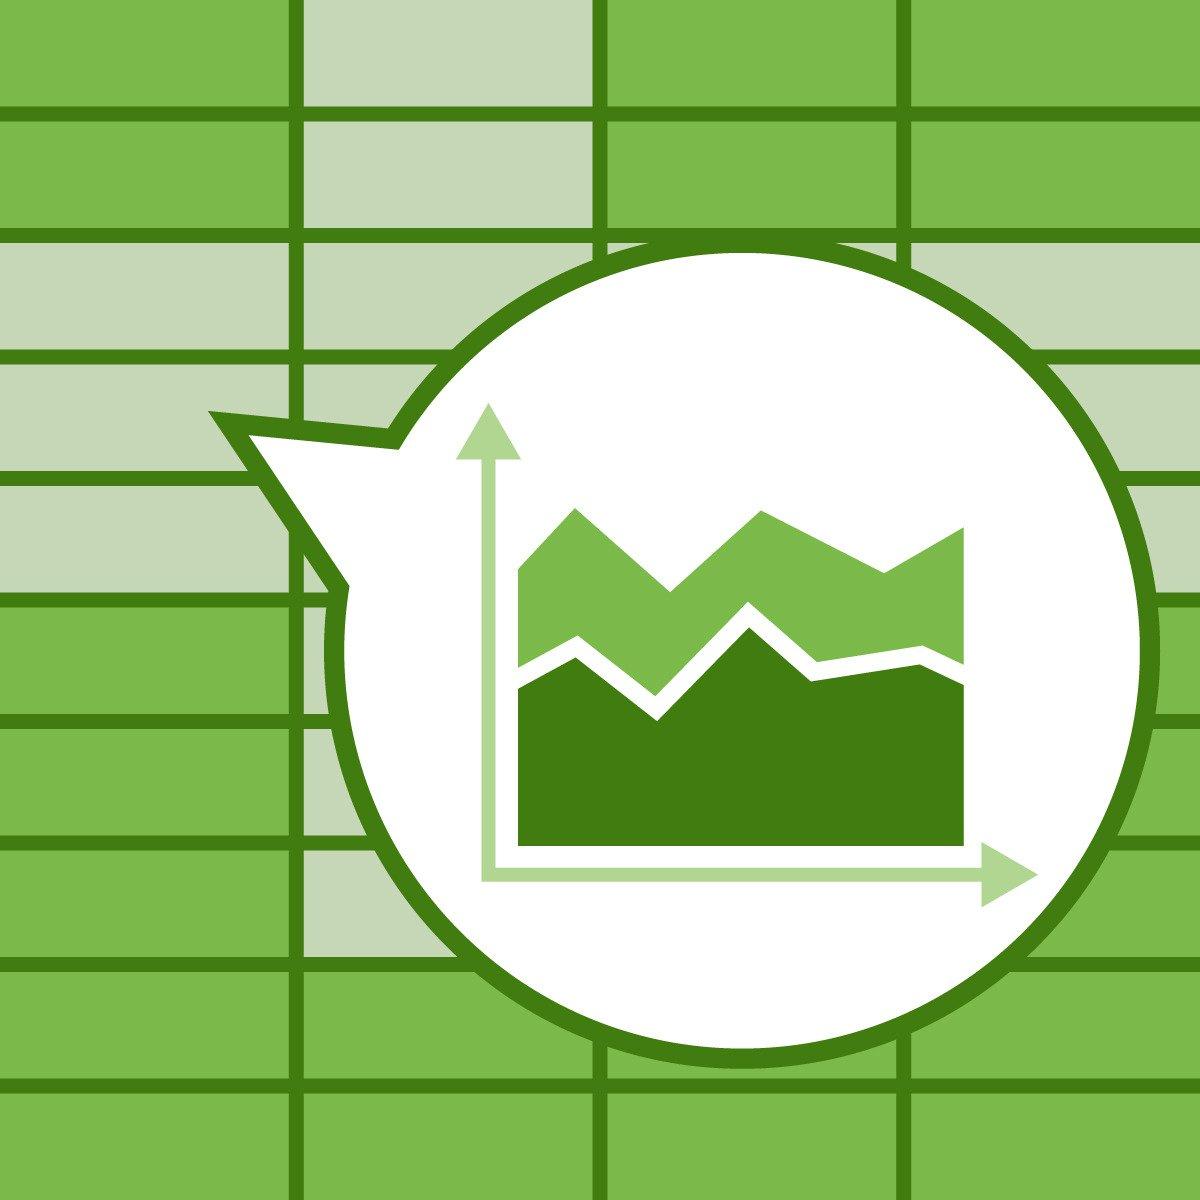 learning excel dataanalysis 2015 linkedin - HD1200×1200